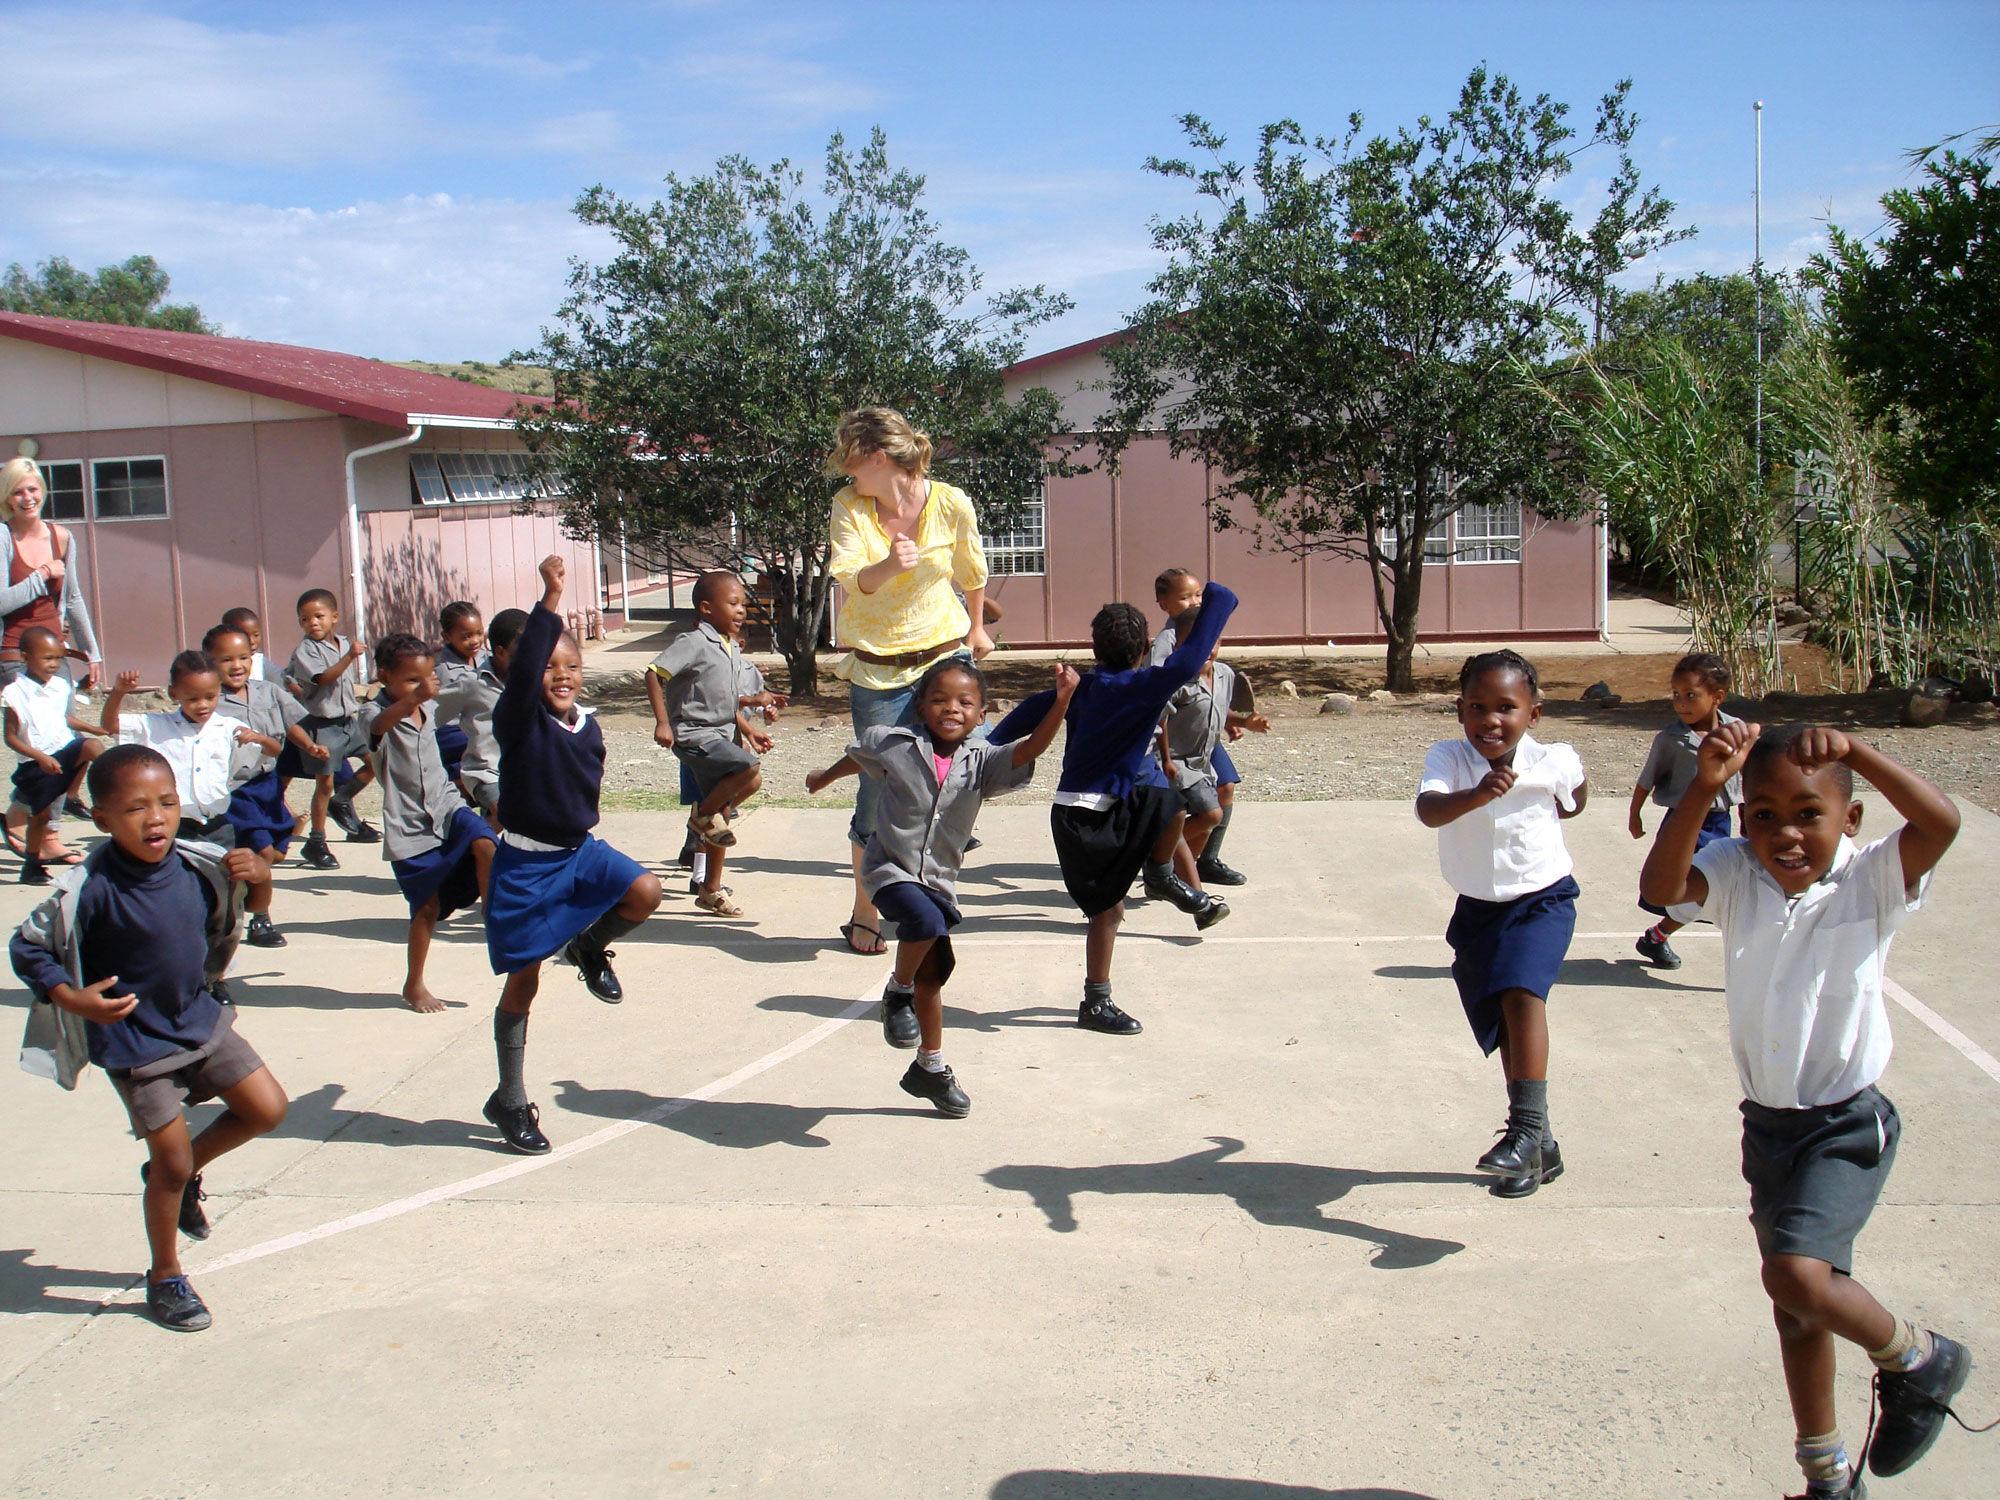 AV volunteer playing with children in South Africa